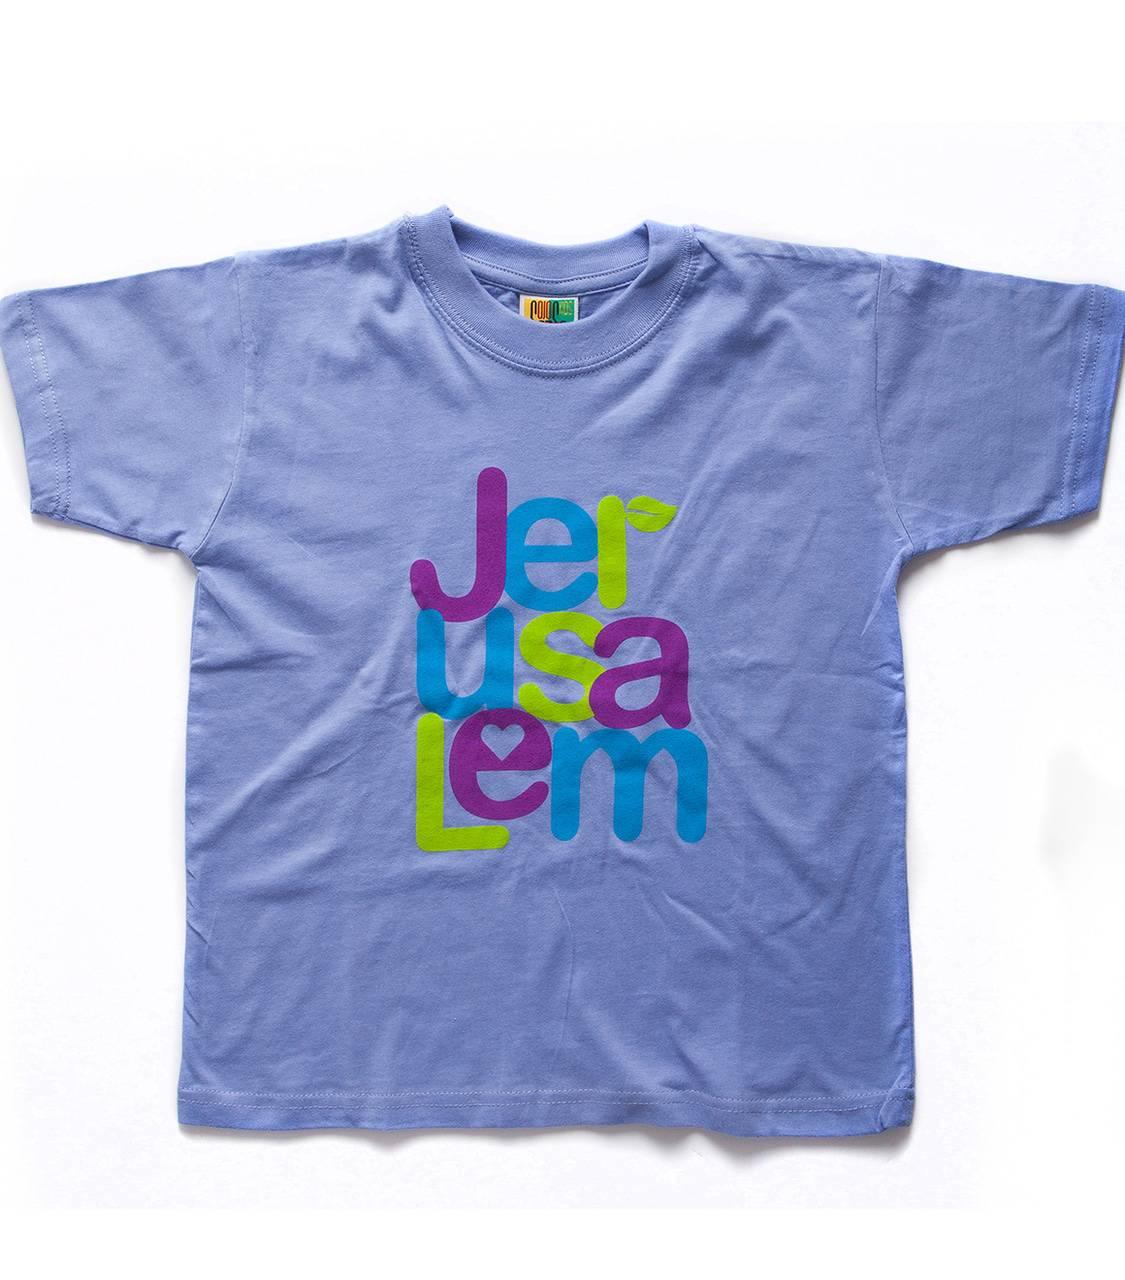 Children's T-Shirt - Jerusalem City LIght Blue